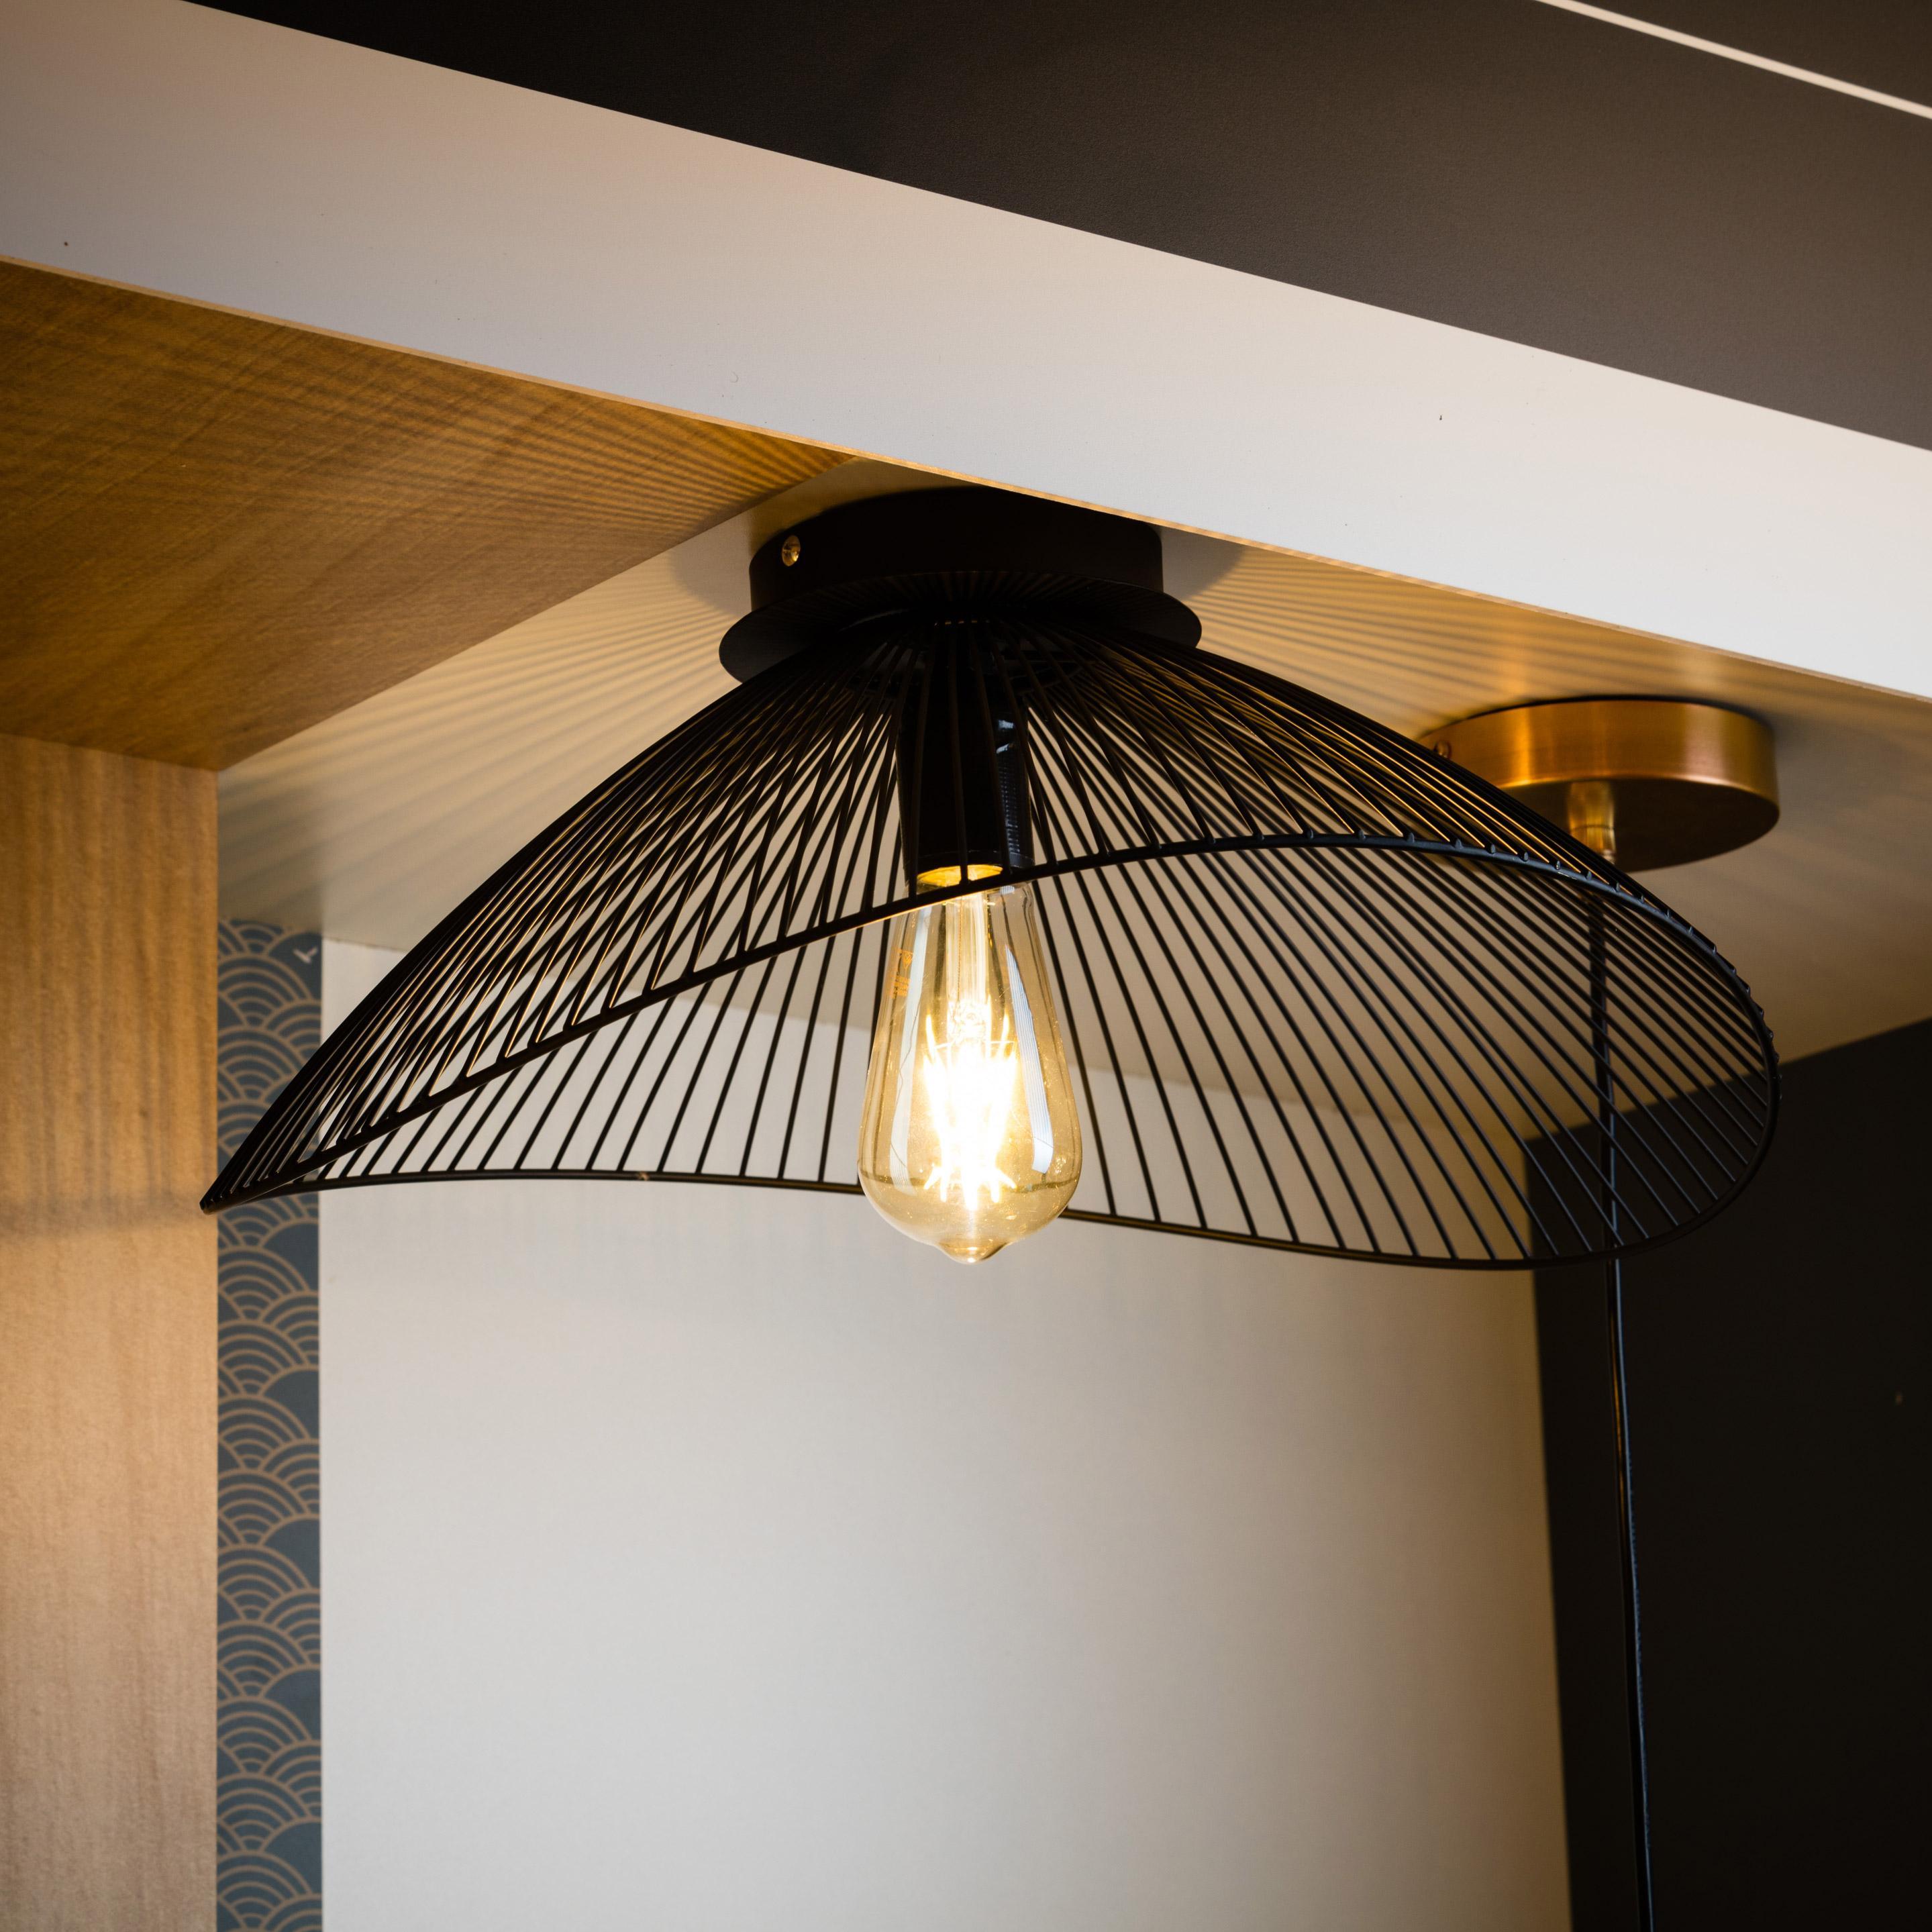 Lampe Plafond Salon Design plafonnier, design métal noir seynave kasteli d.45 cm